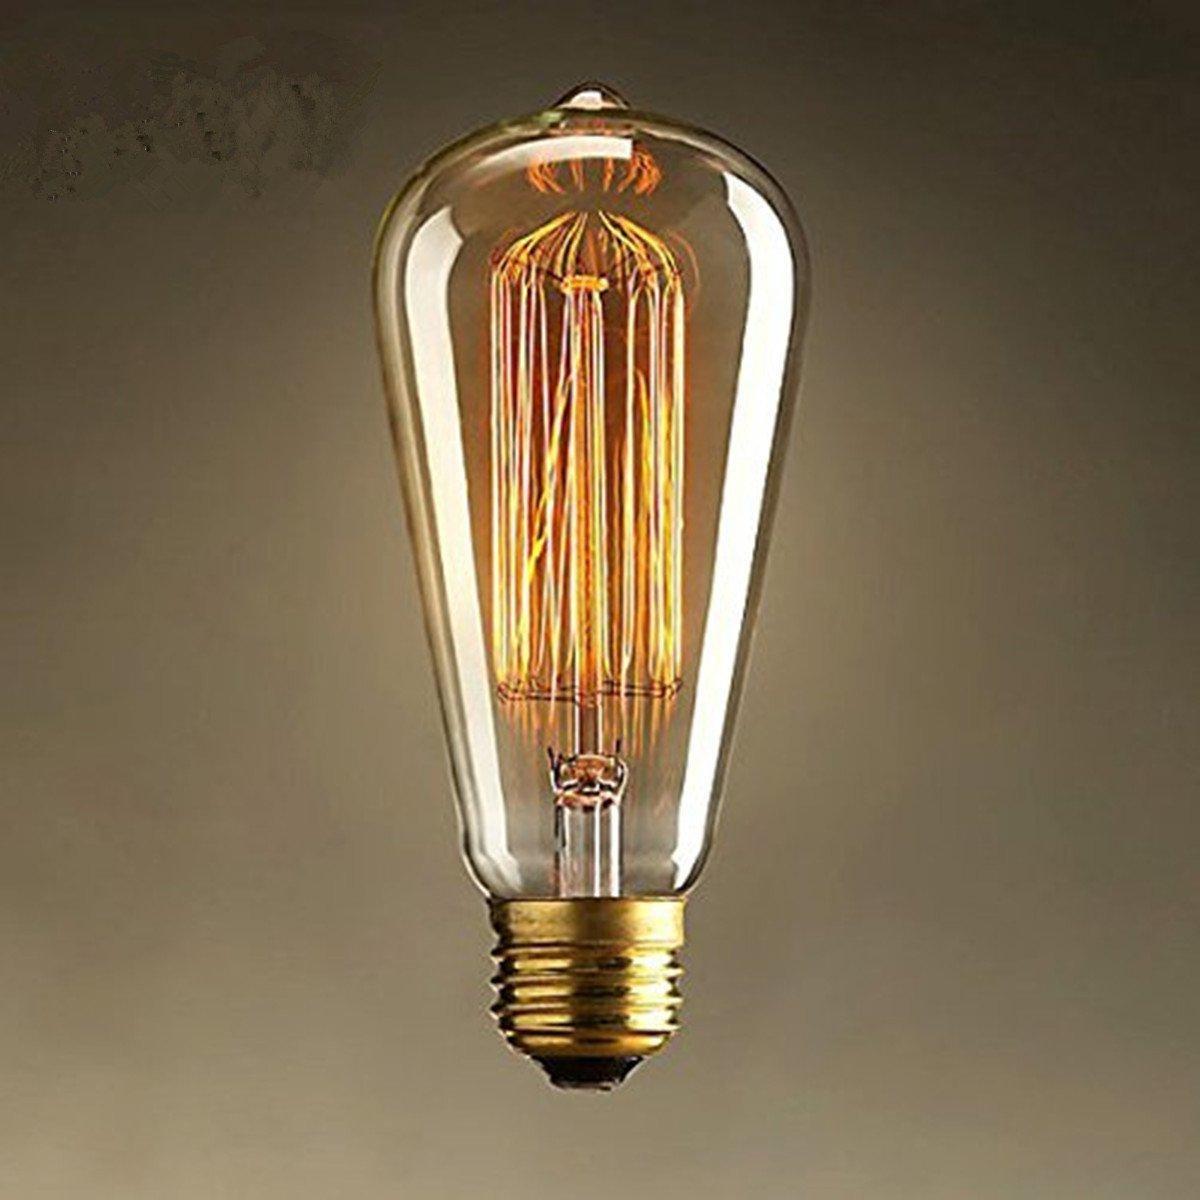 Hanger Vintage Light Retro Old Fashioned Edison Style Screw19